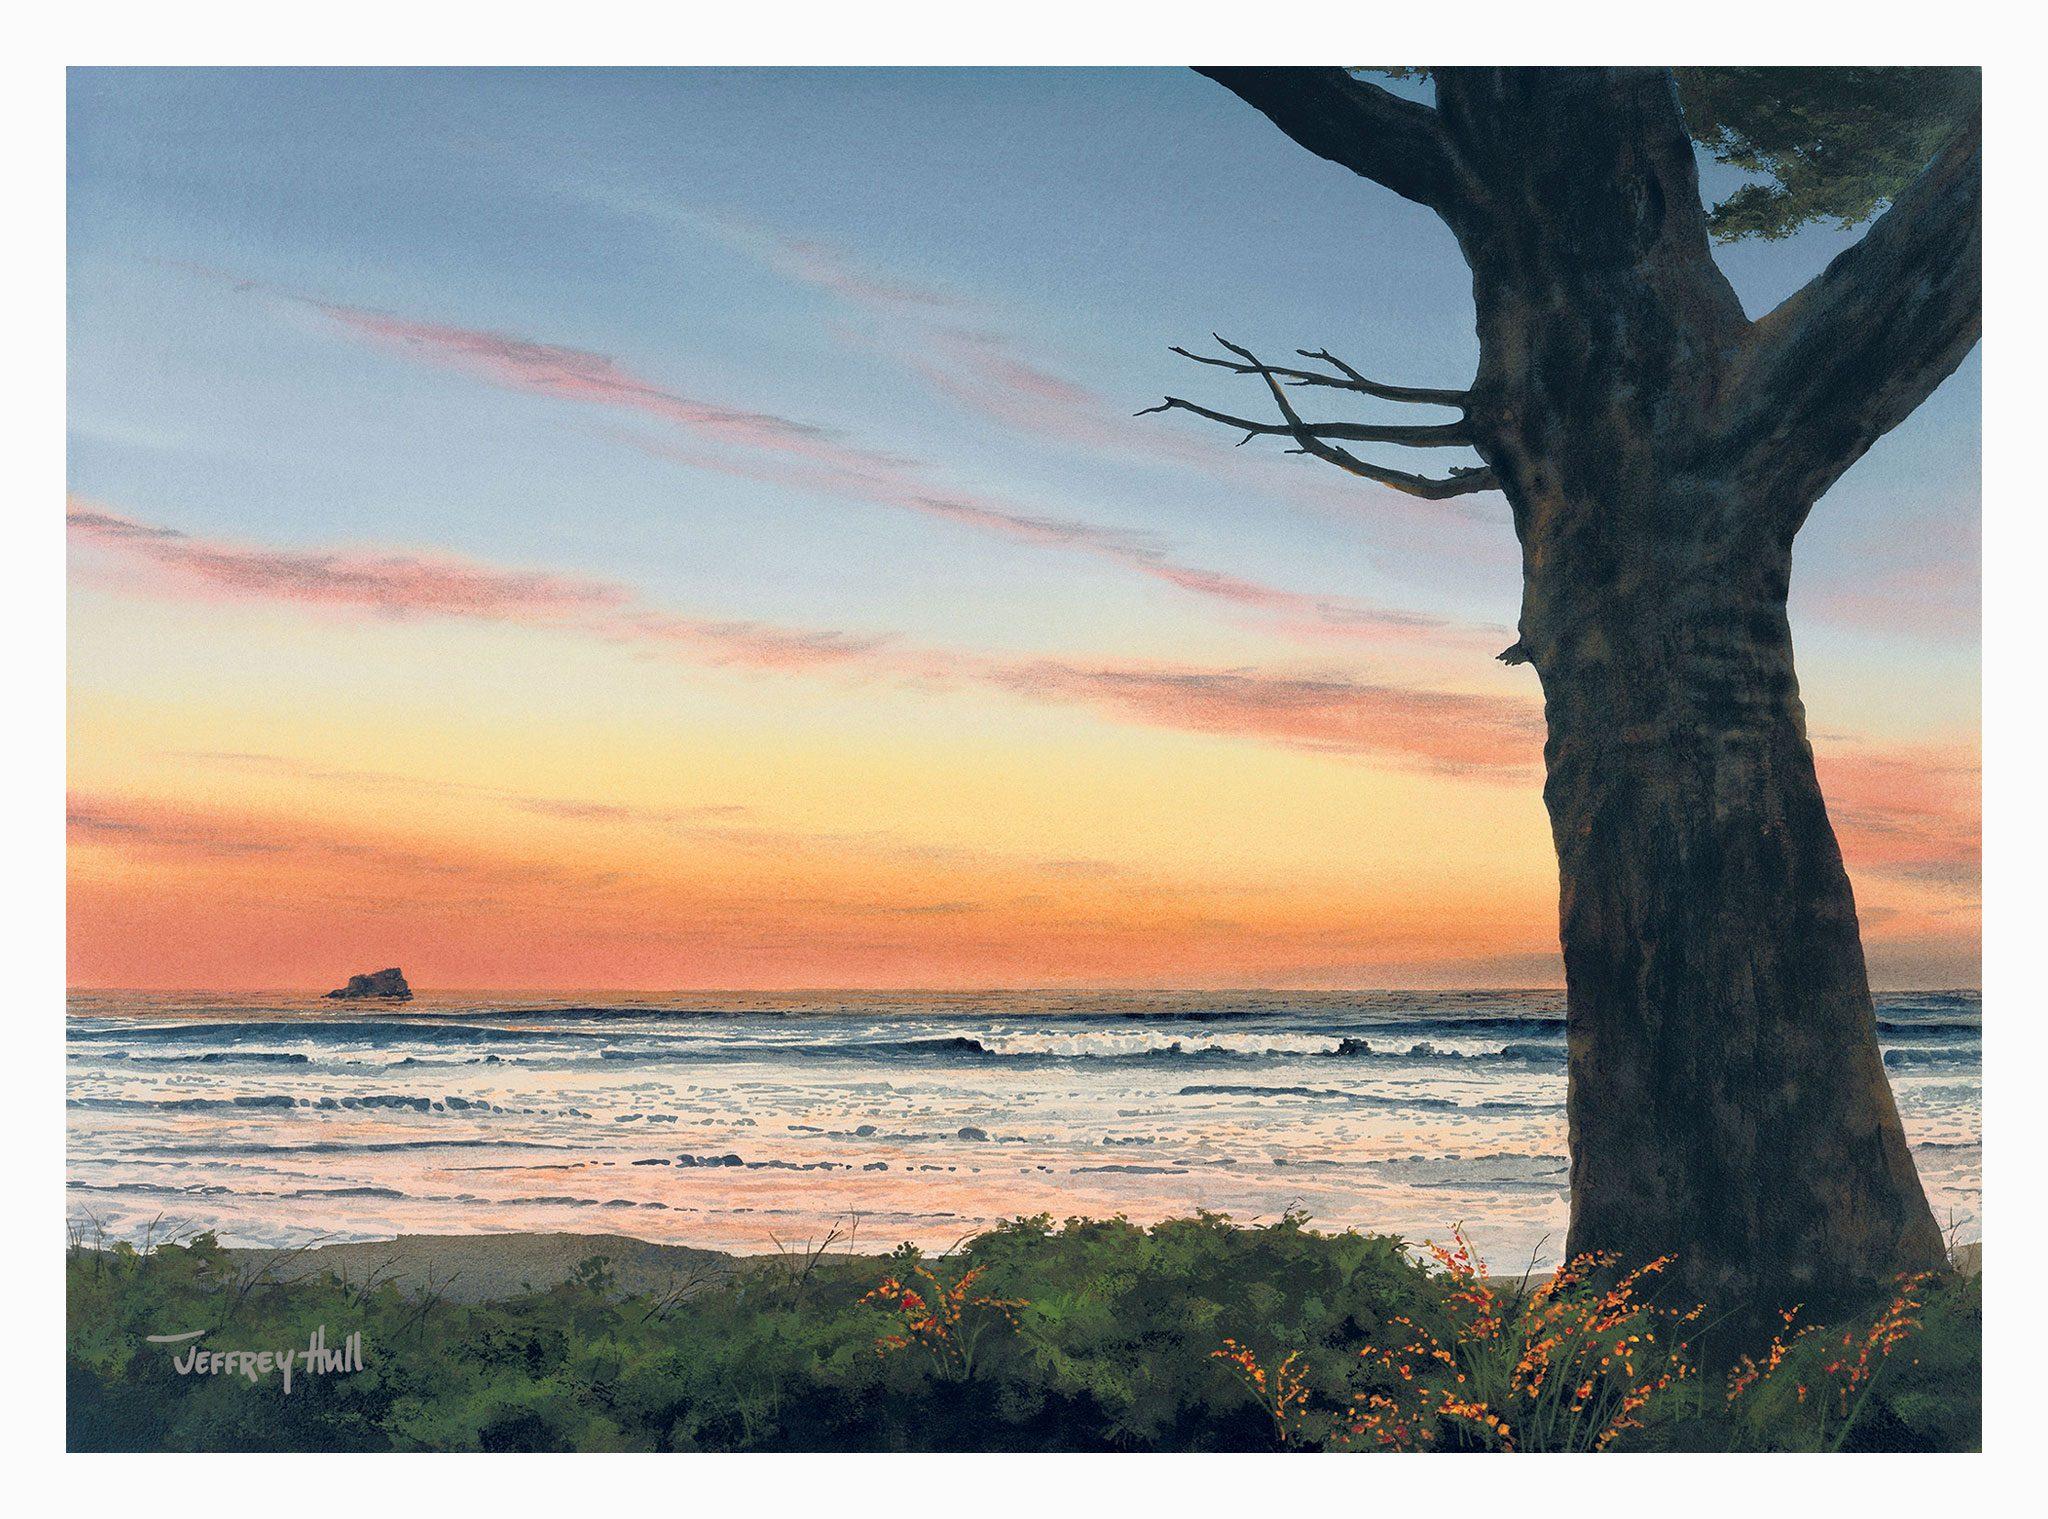 Sunset-Overlook-LimEd-Unframed-4-Website-2021